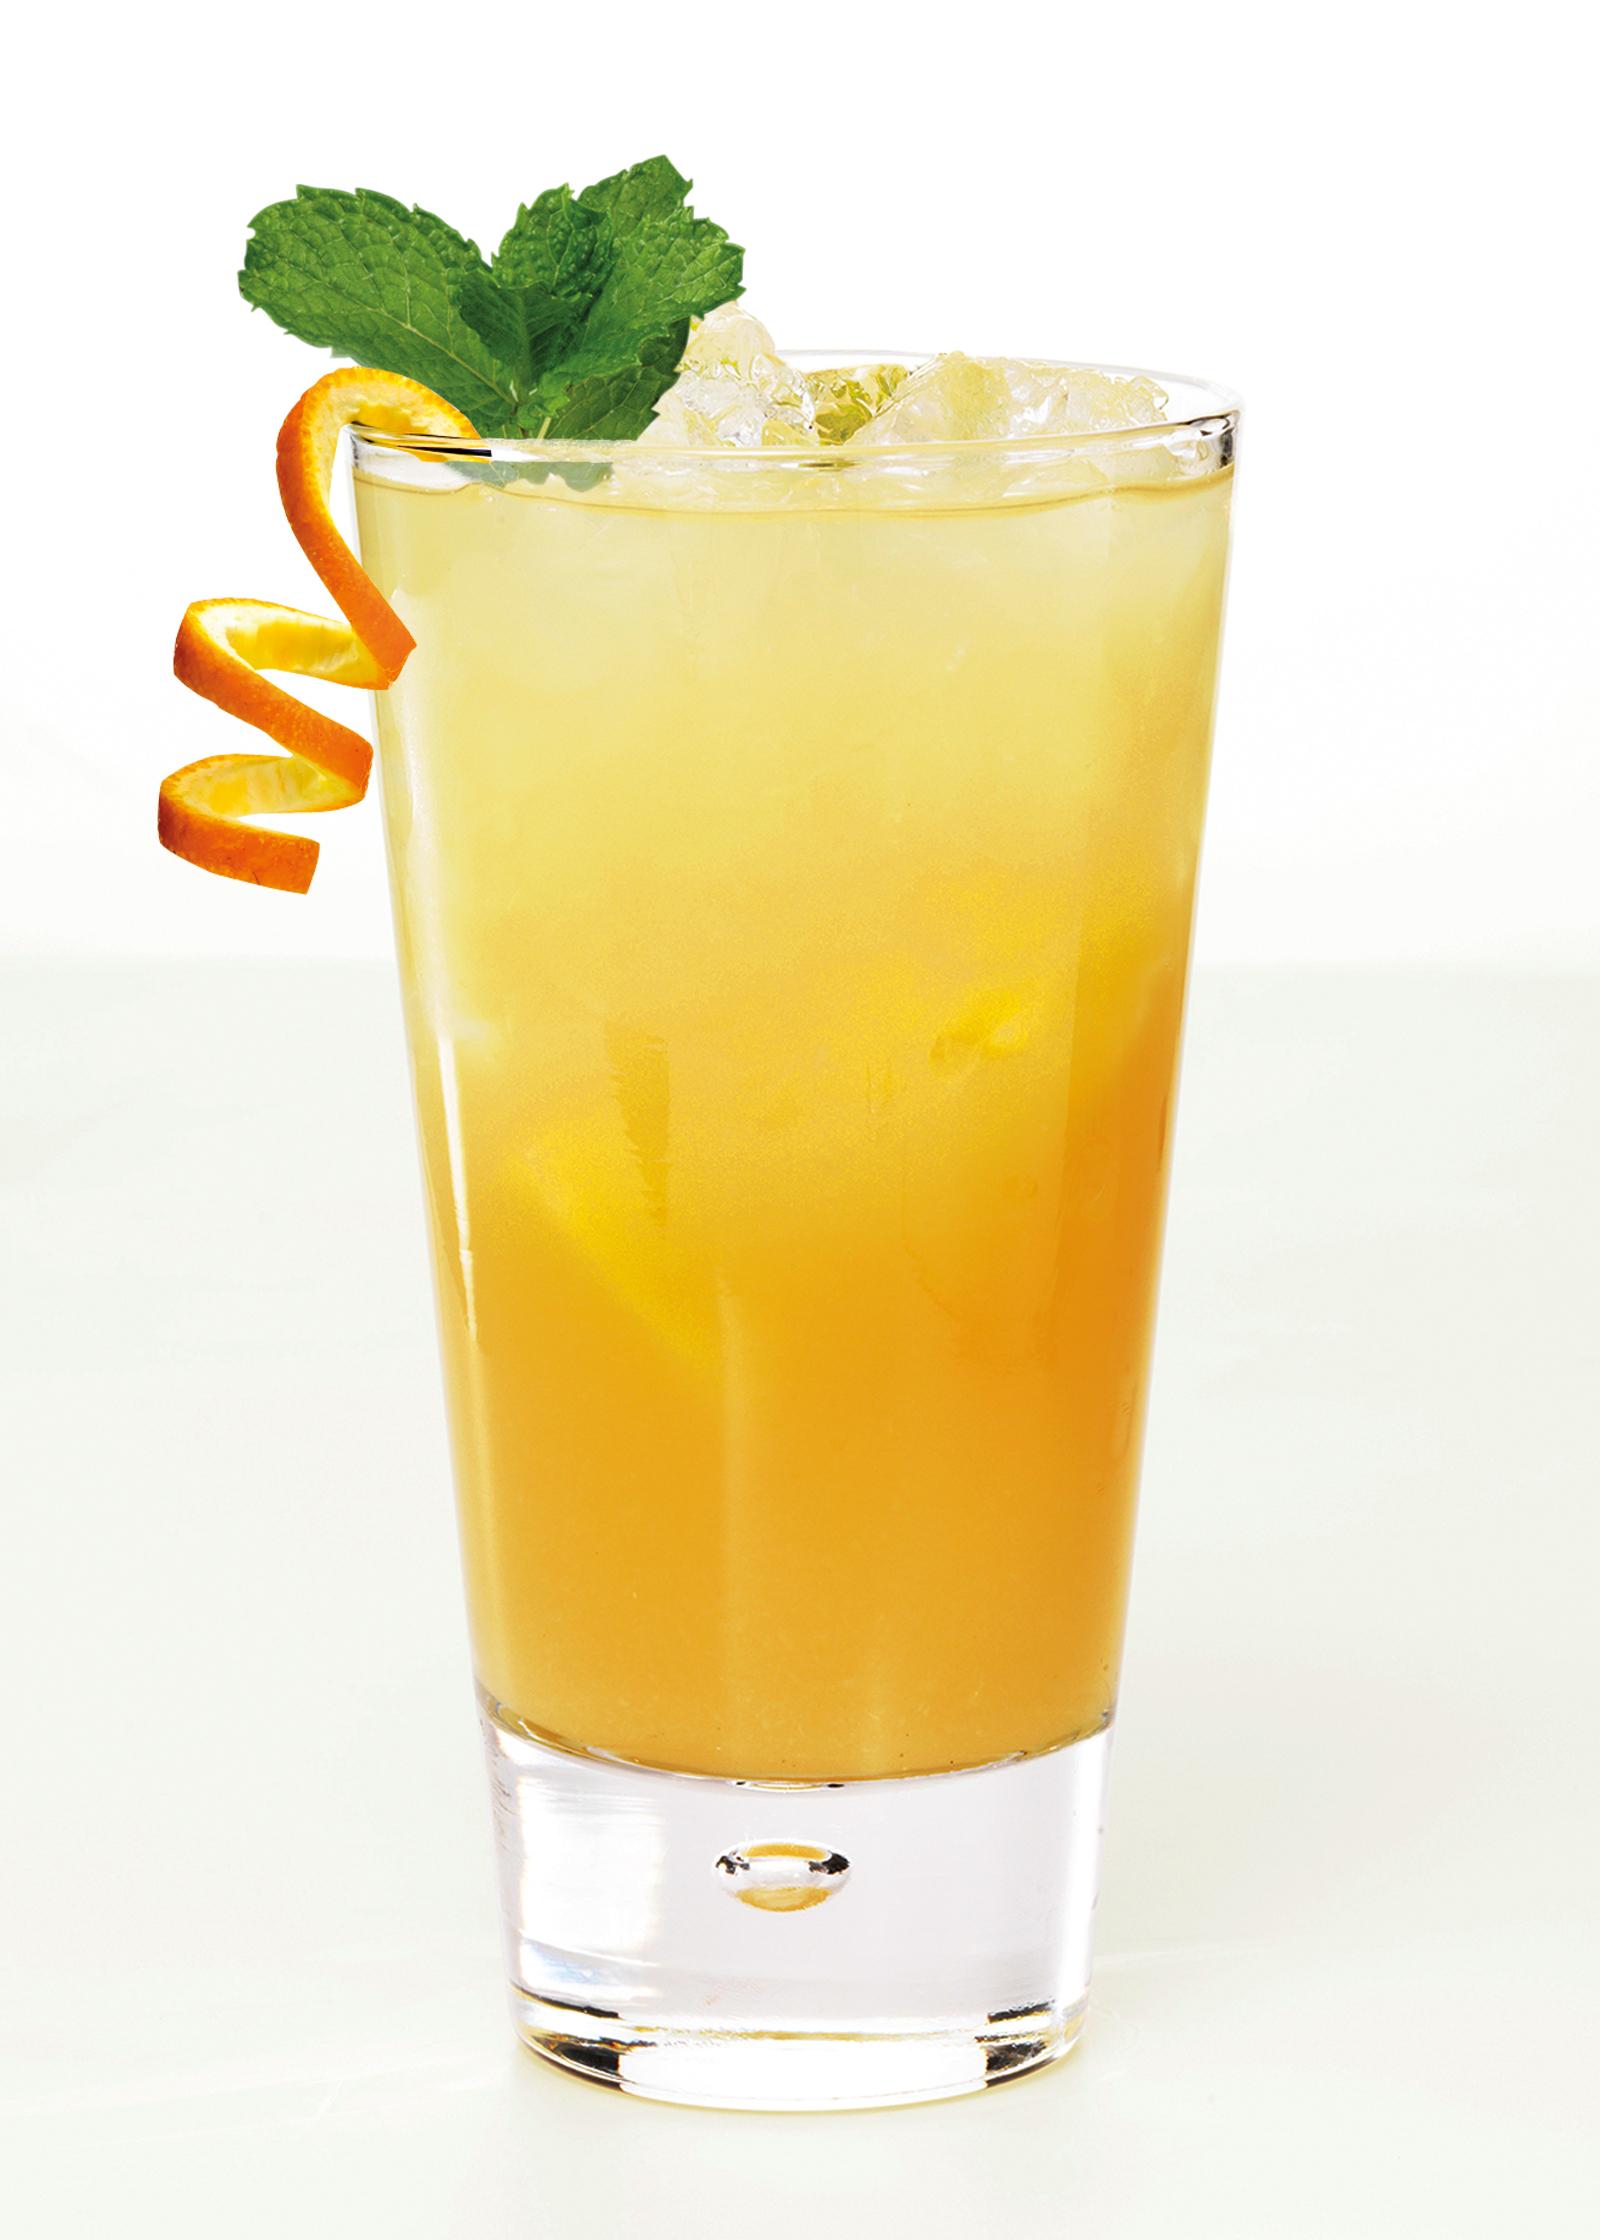 Finlandia announces vodka cup us finalists cocktails 365 for Cocktail yellow bird